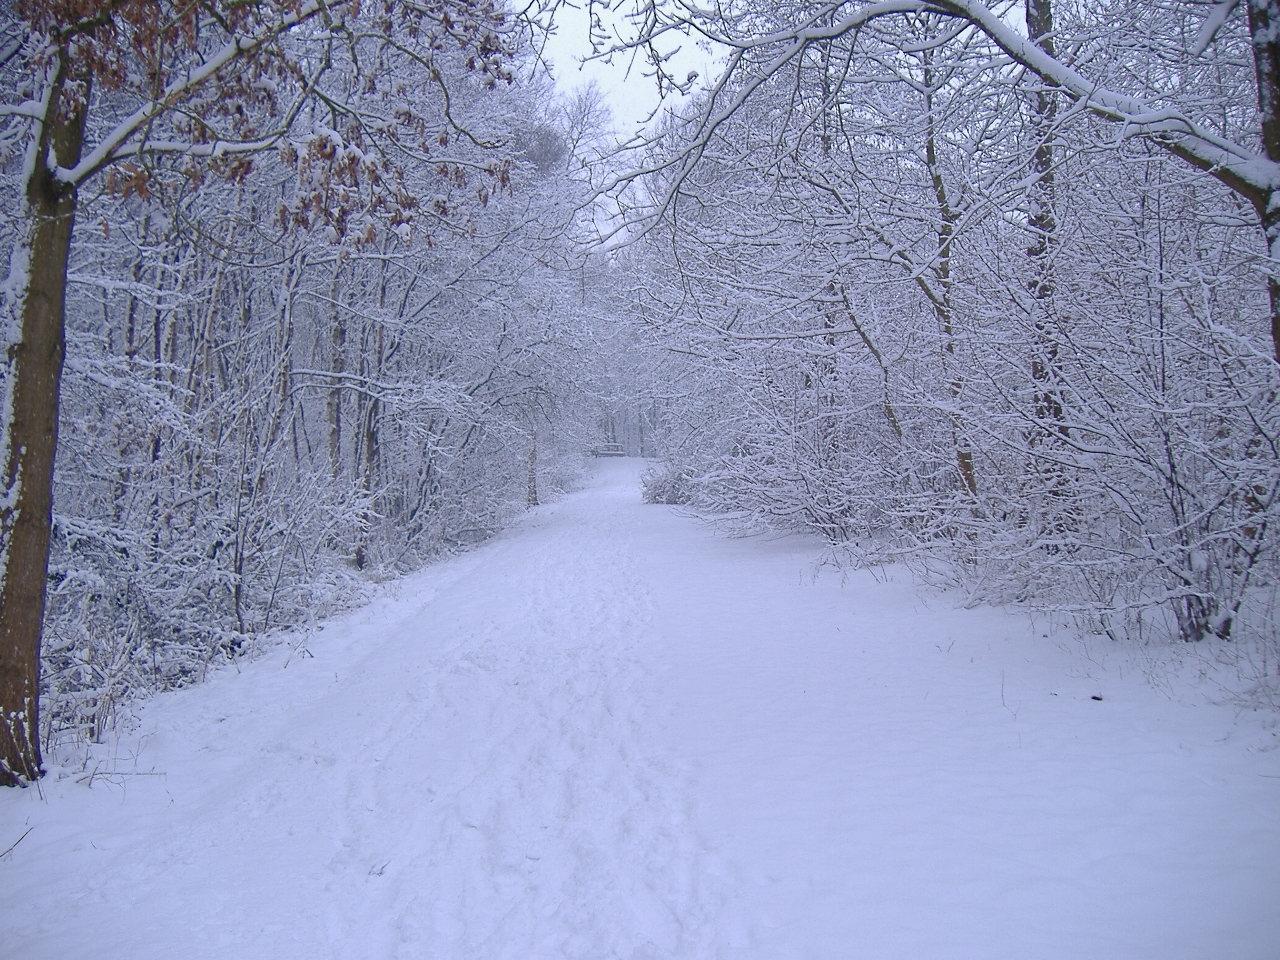 janelle mcintosh winter scene background